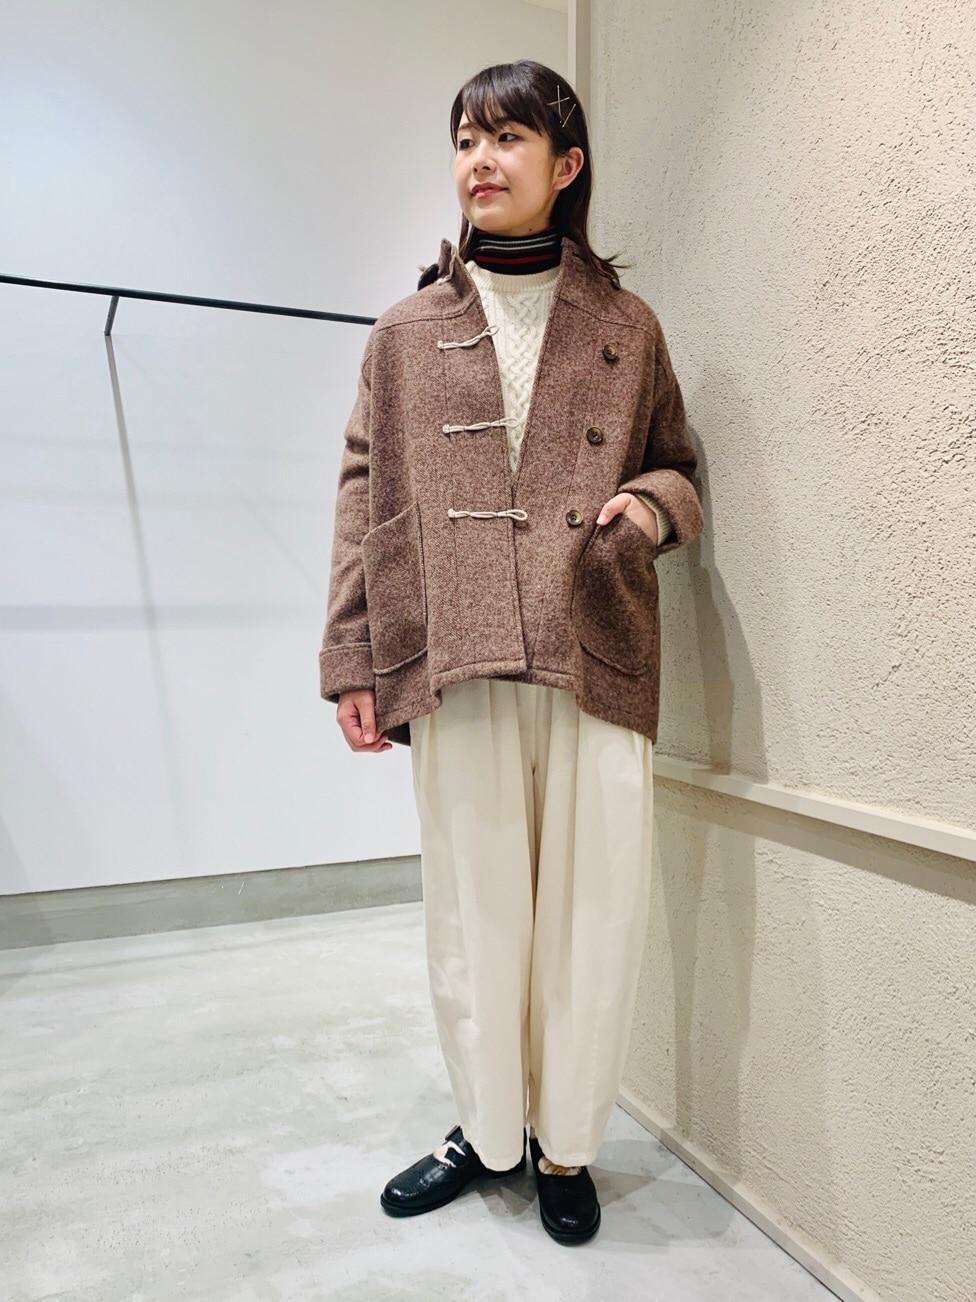 chambre de charme 横浜ジョイナス 身長:162cm 2020.11.11